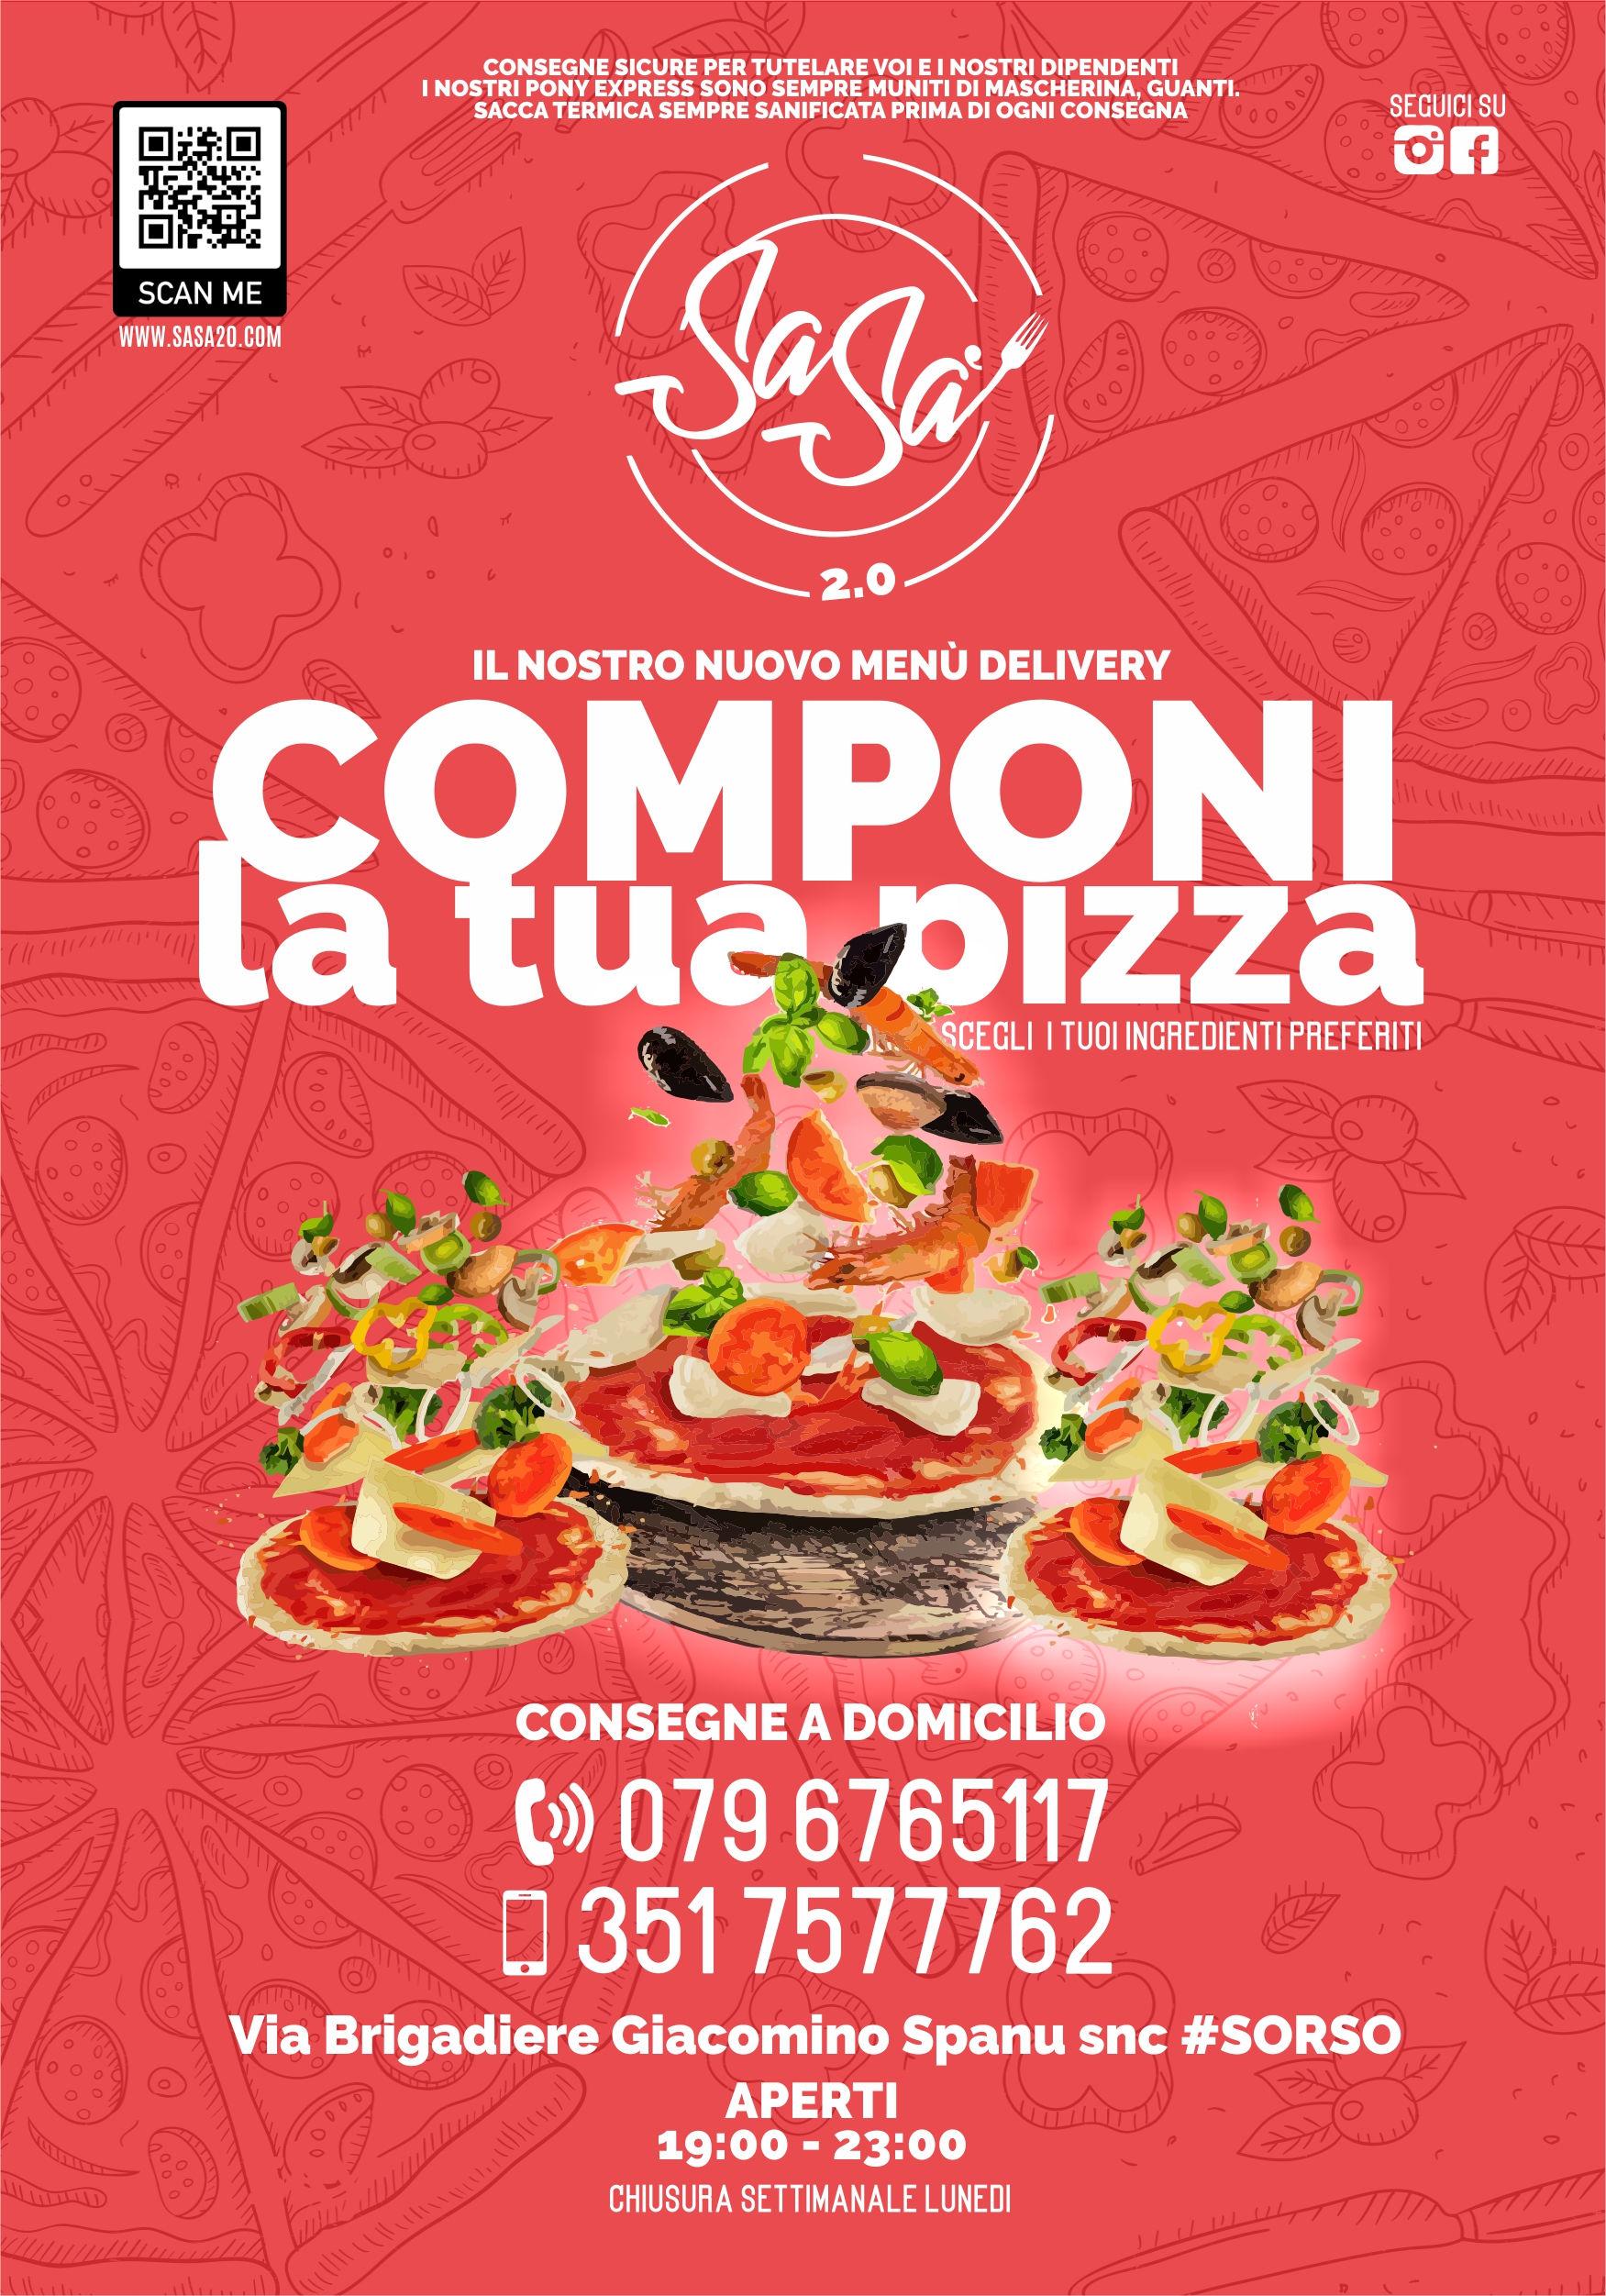 Volantino-Pizzeria-Sasa-Sorso